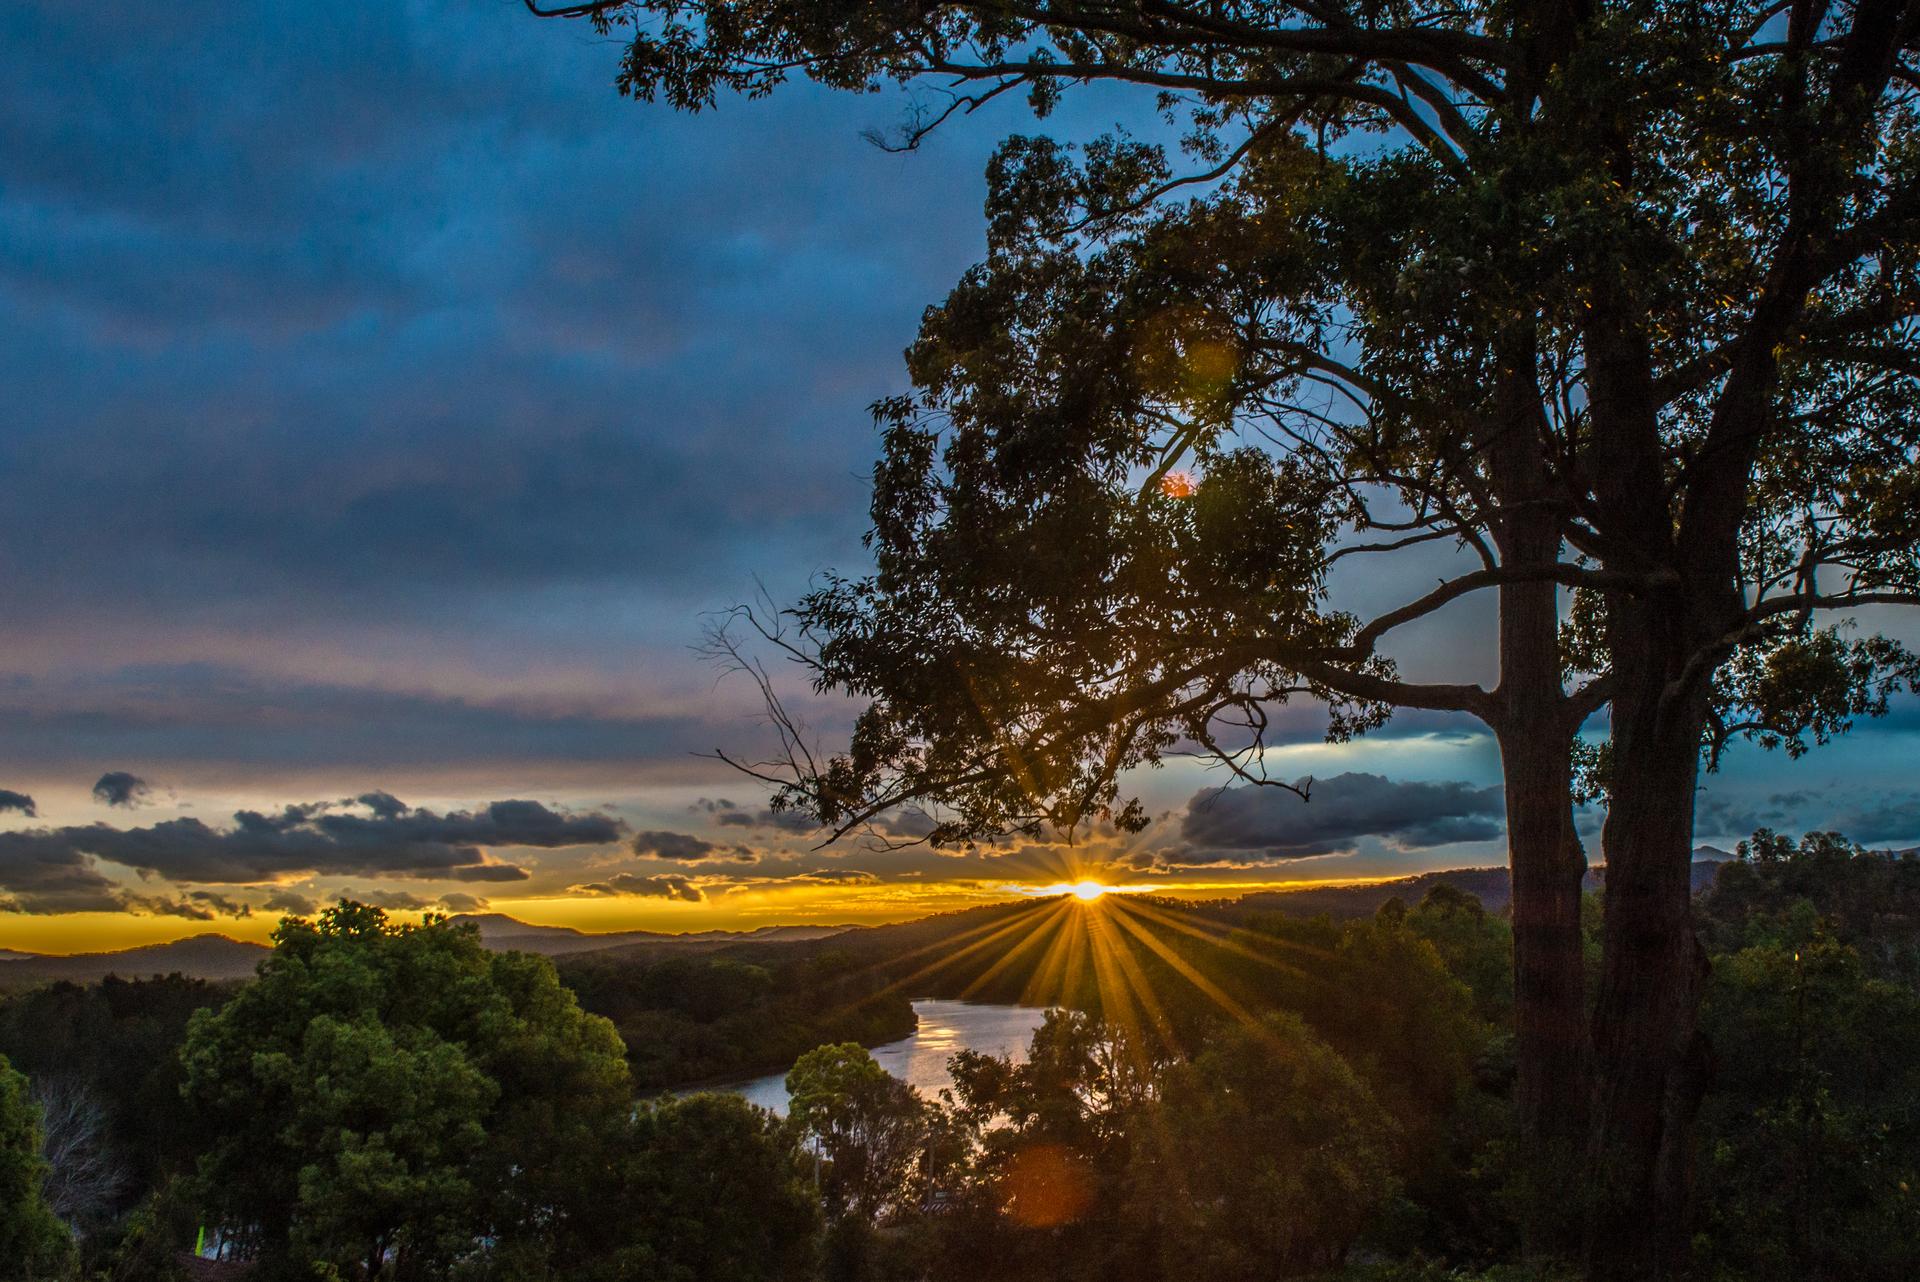 rapton | russell.kay, landscape, sky, sunset